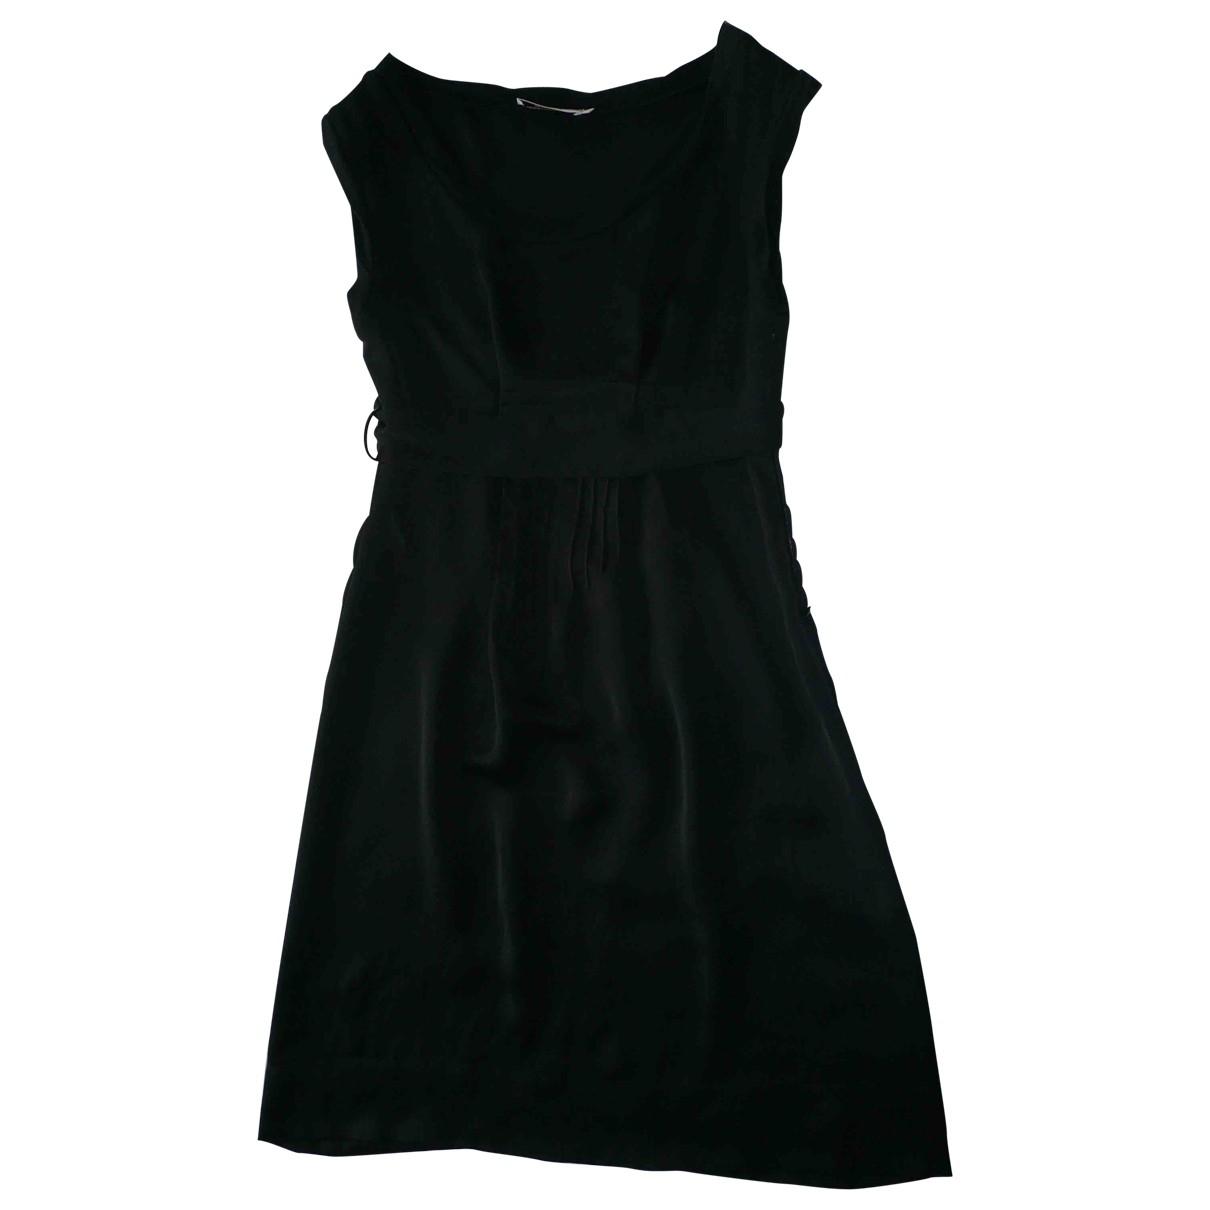 Comptoir Des Cotonniers \N Kleid in  Schwarz Polyester